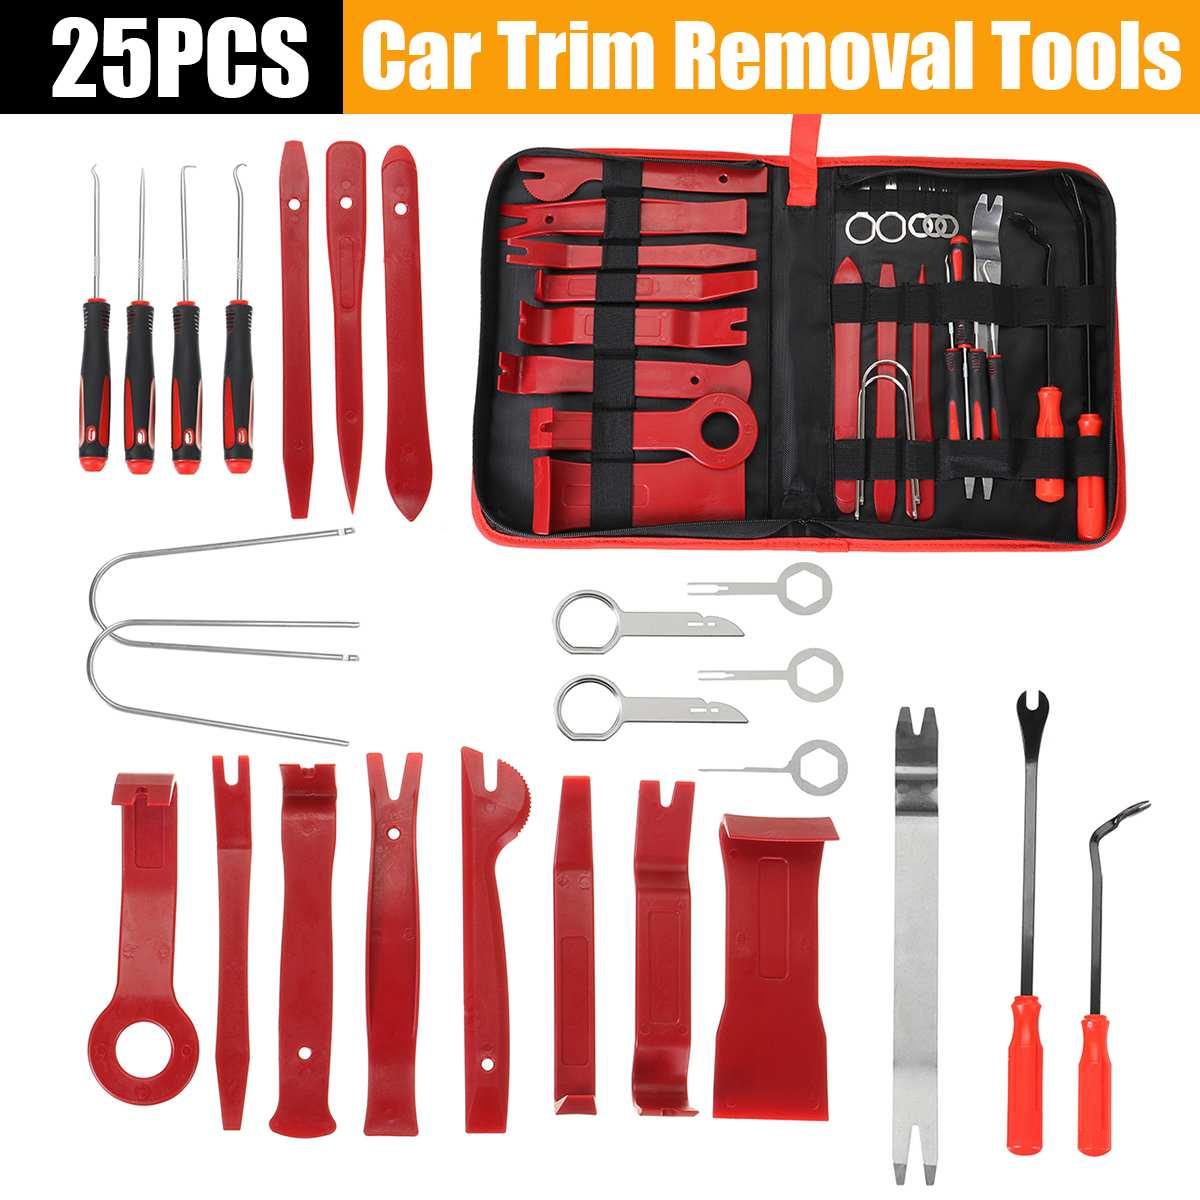 25pcs Car Disassembly Tools DVD Stereo Refit Kits Interior Plastic Trim Panel Dashboard Installation Removal Repair Tools